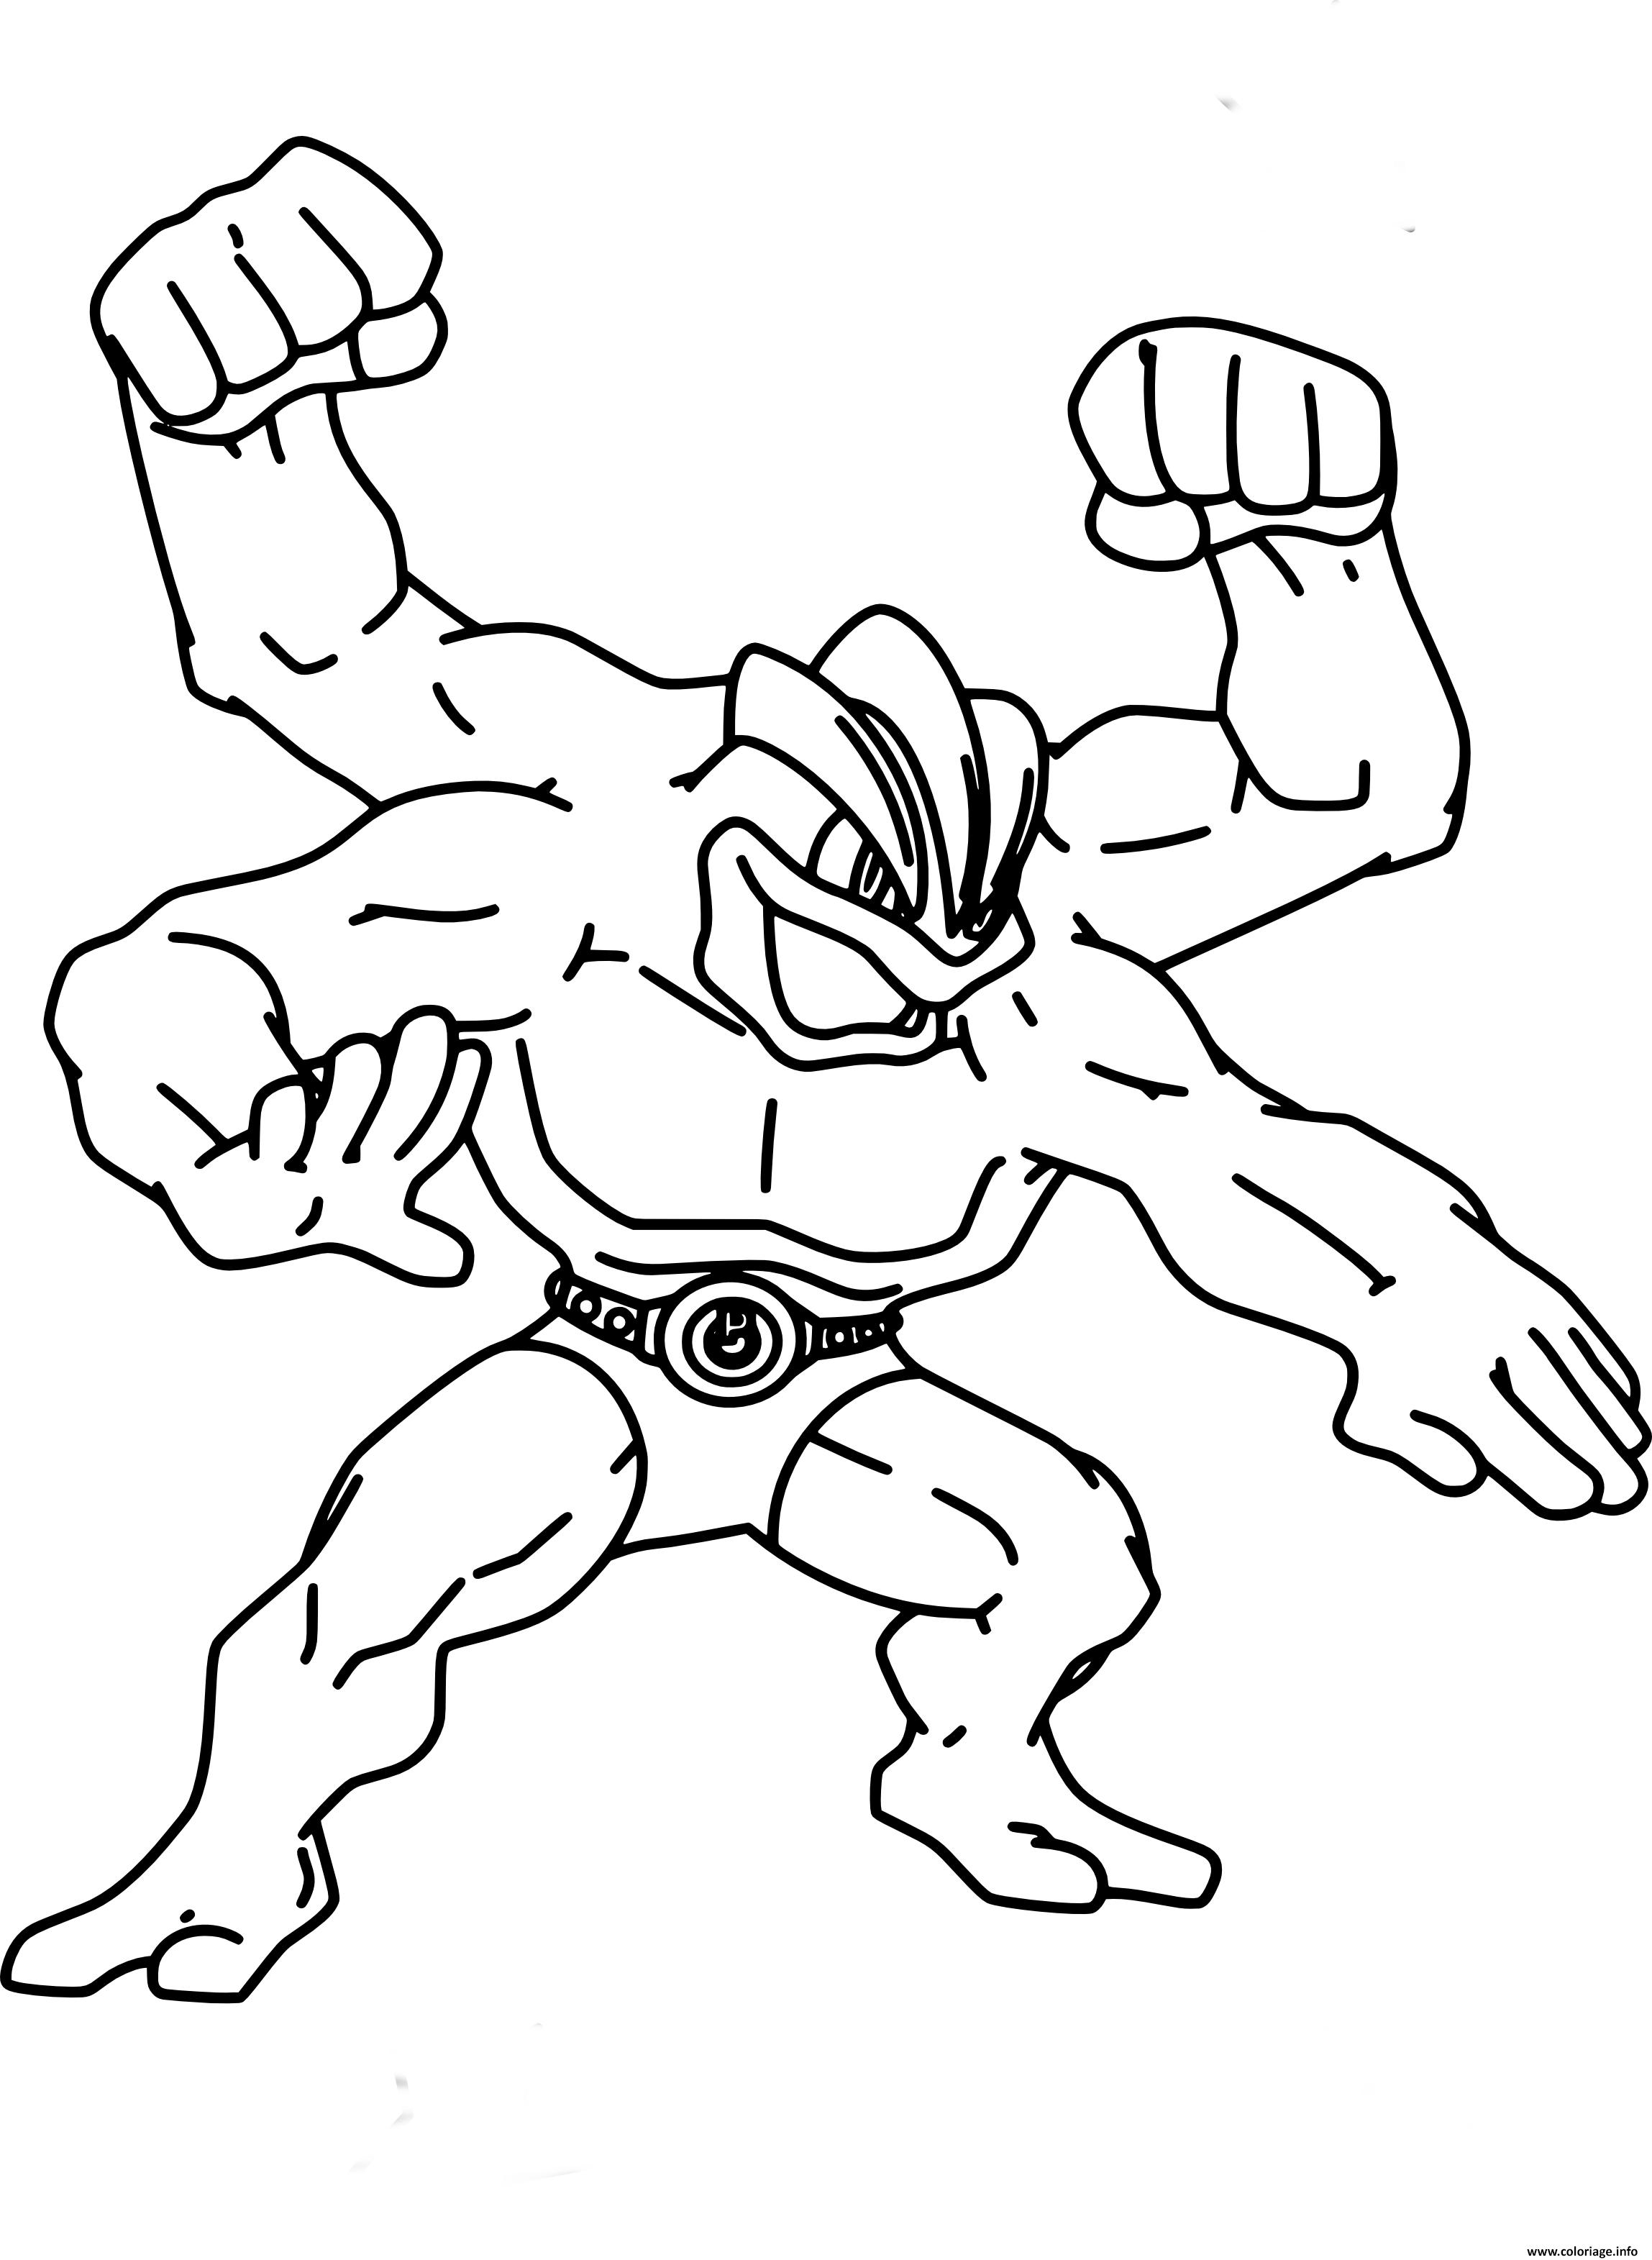 Frais Dessin A Imprimer Pokemon Raichu